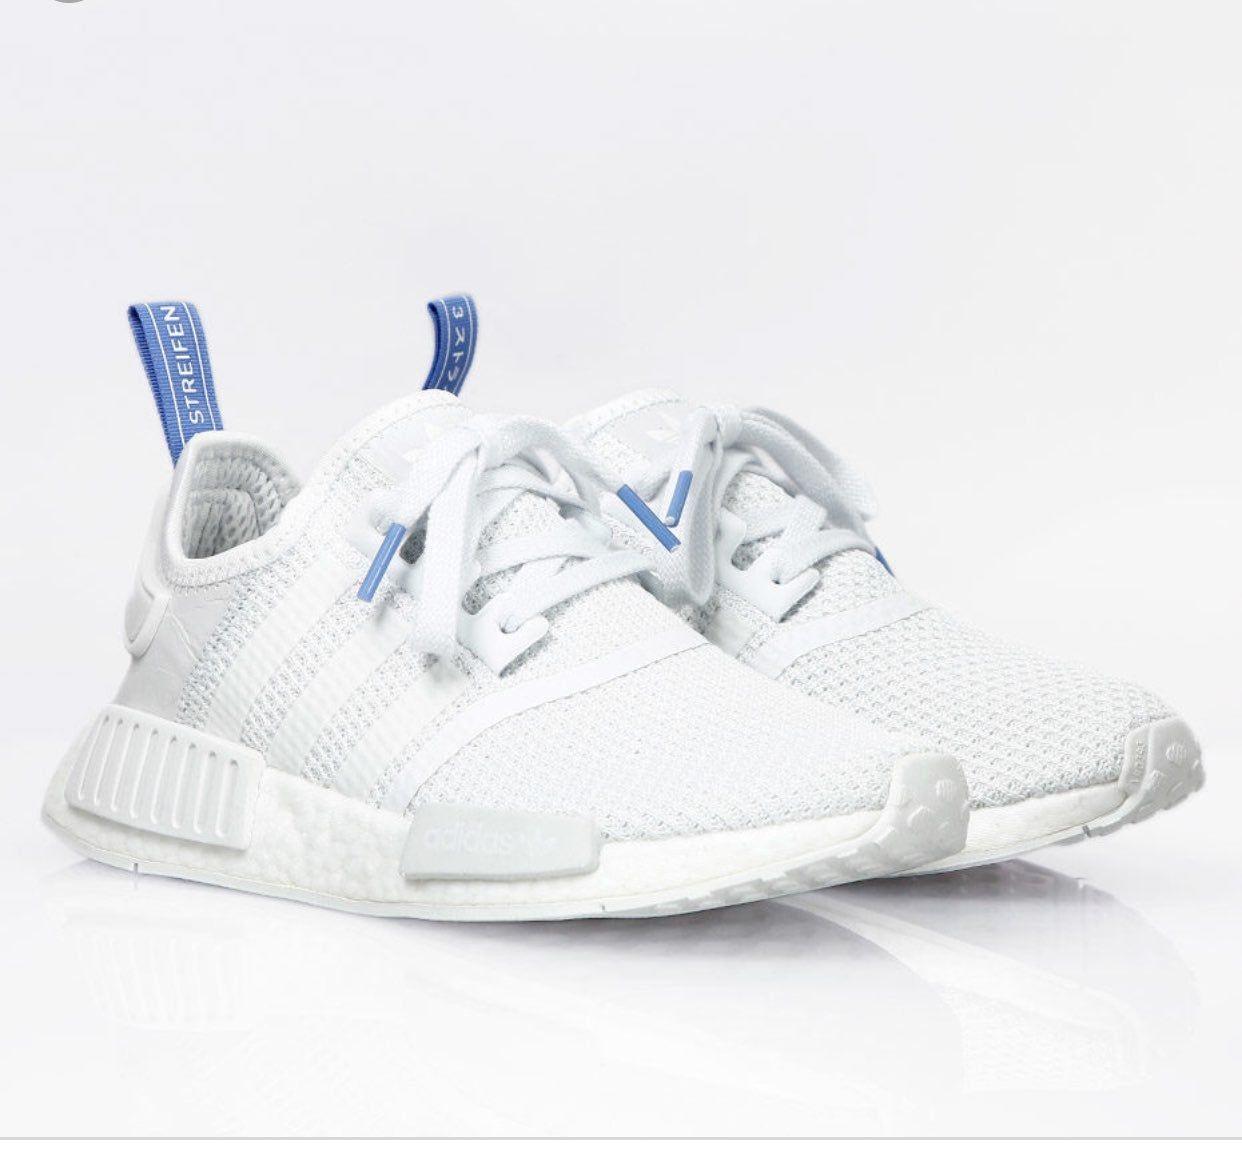 Adidas nmd r1 crystal white clear lilac